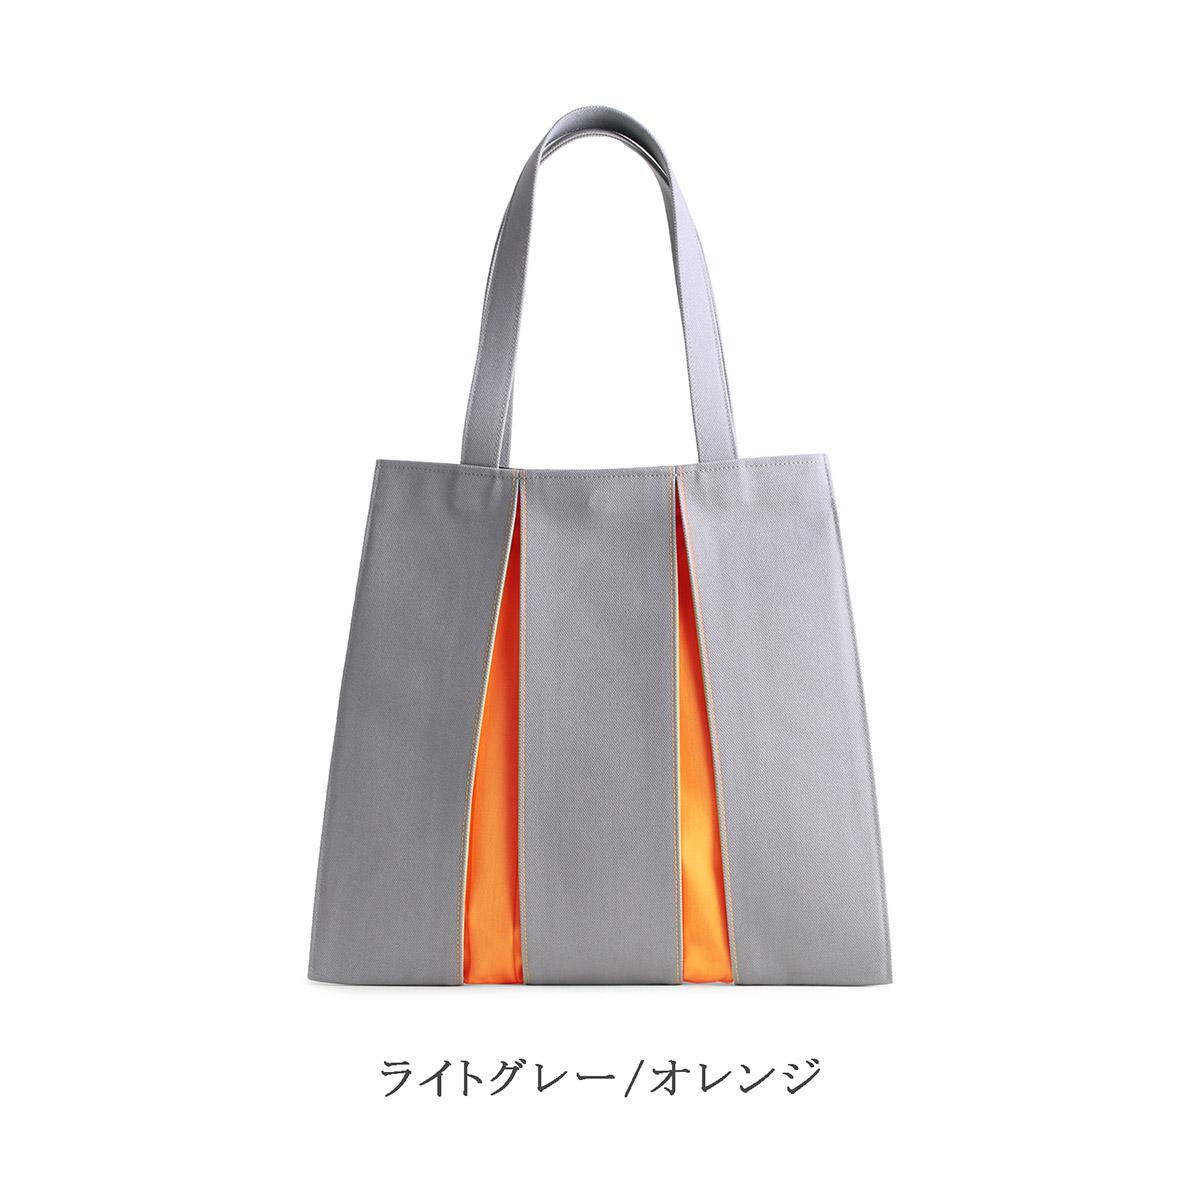 KOSHO ougi トートバック MH